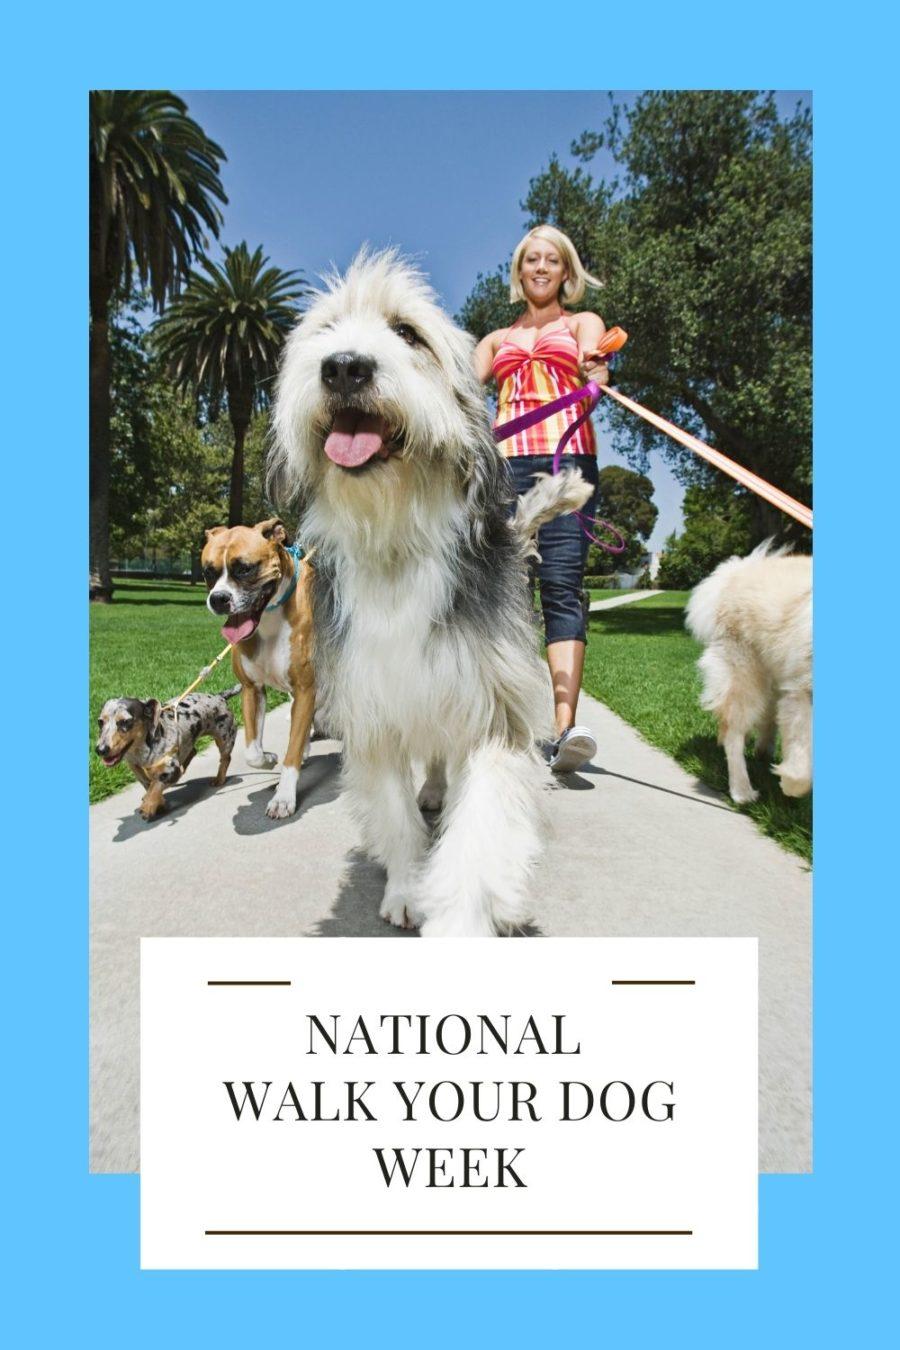 National Walk Your Dog Week